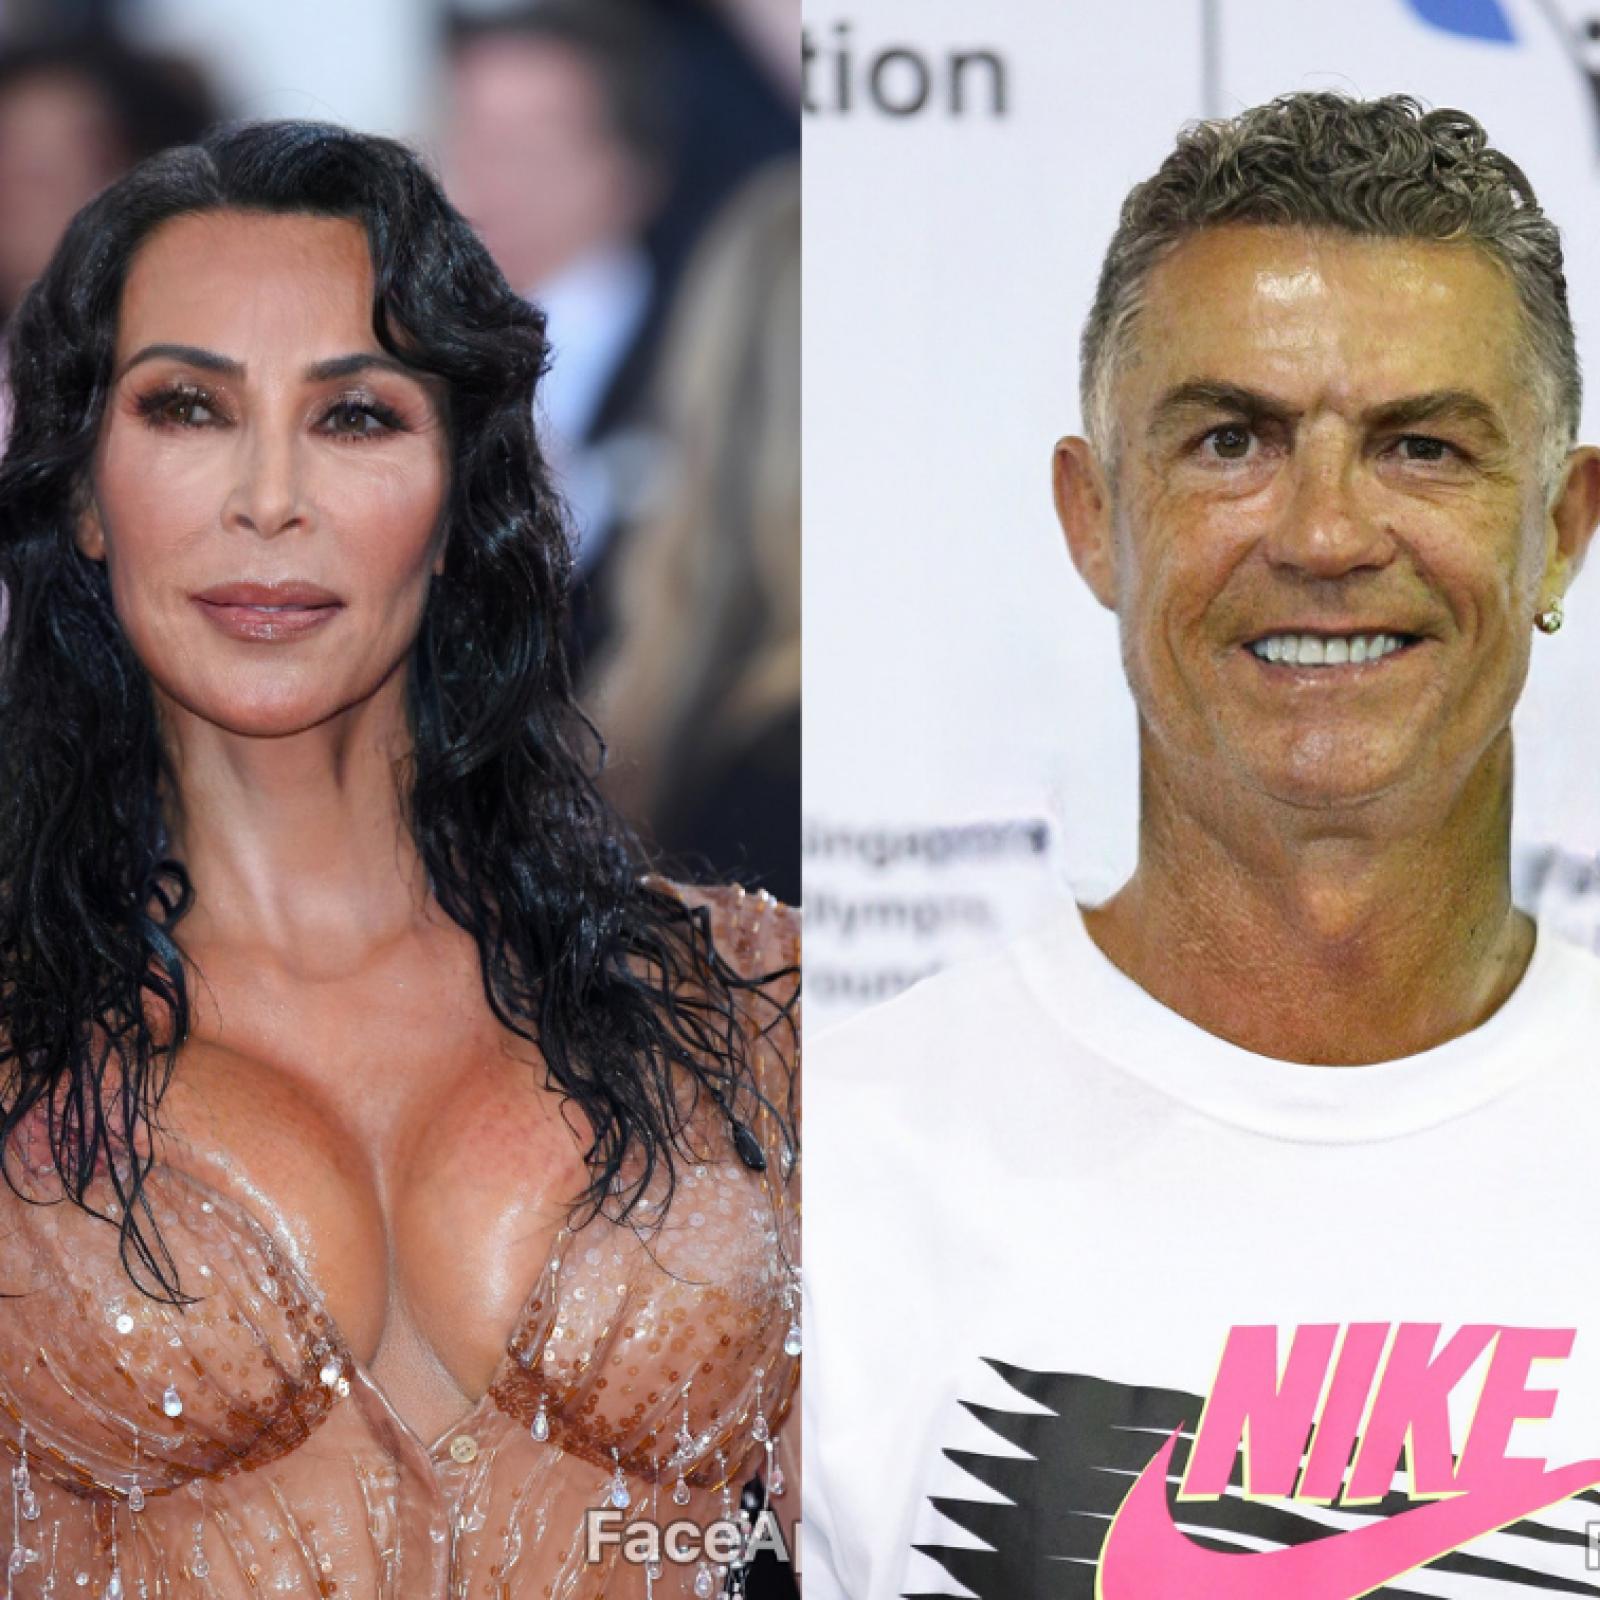 kim-kardashian-facepp-cristiano-ronaldo.png?w=1600&h=1600&q=88&f=827acf787f87045fcfc0ef67c0a90206